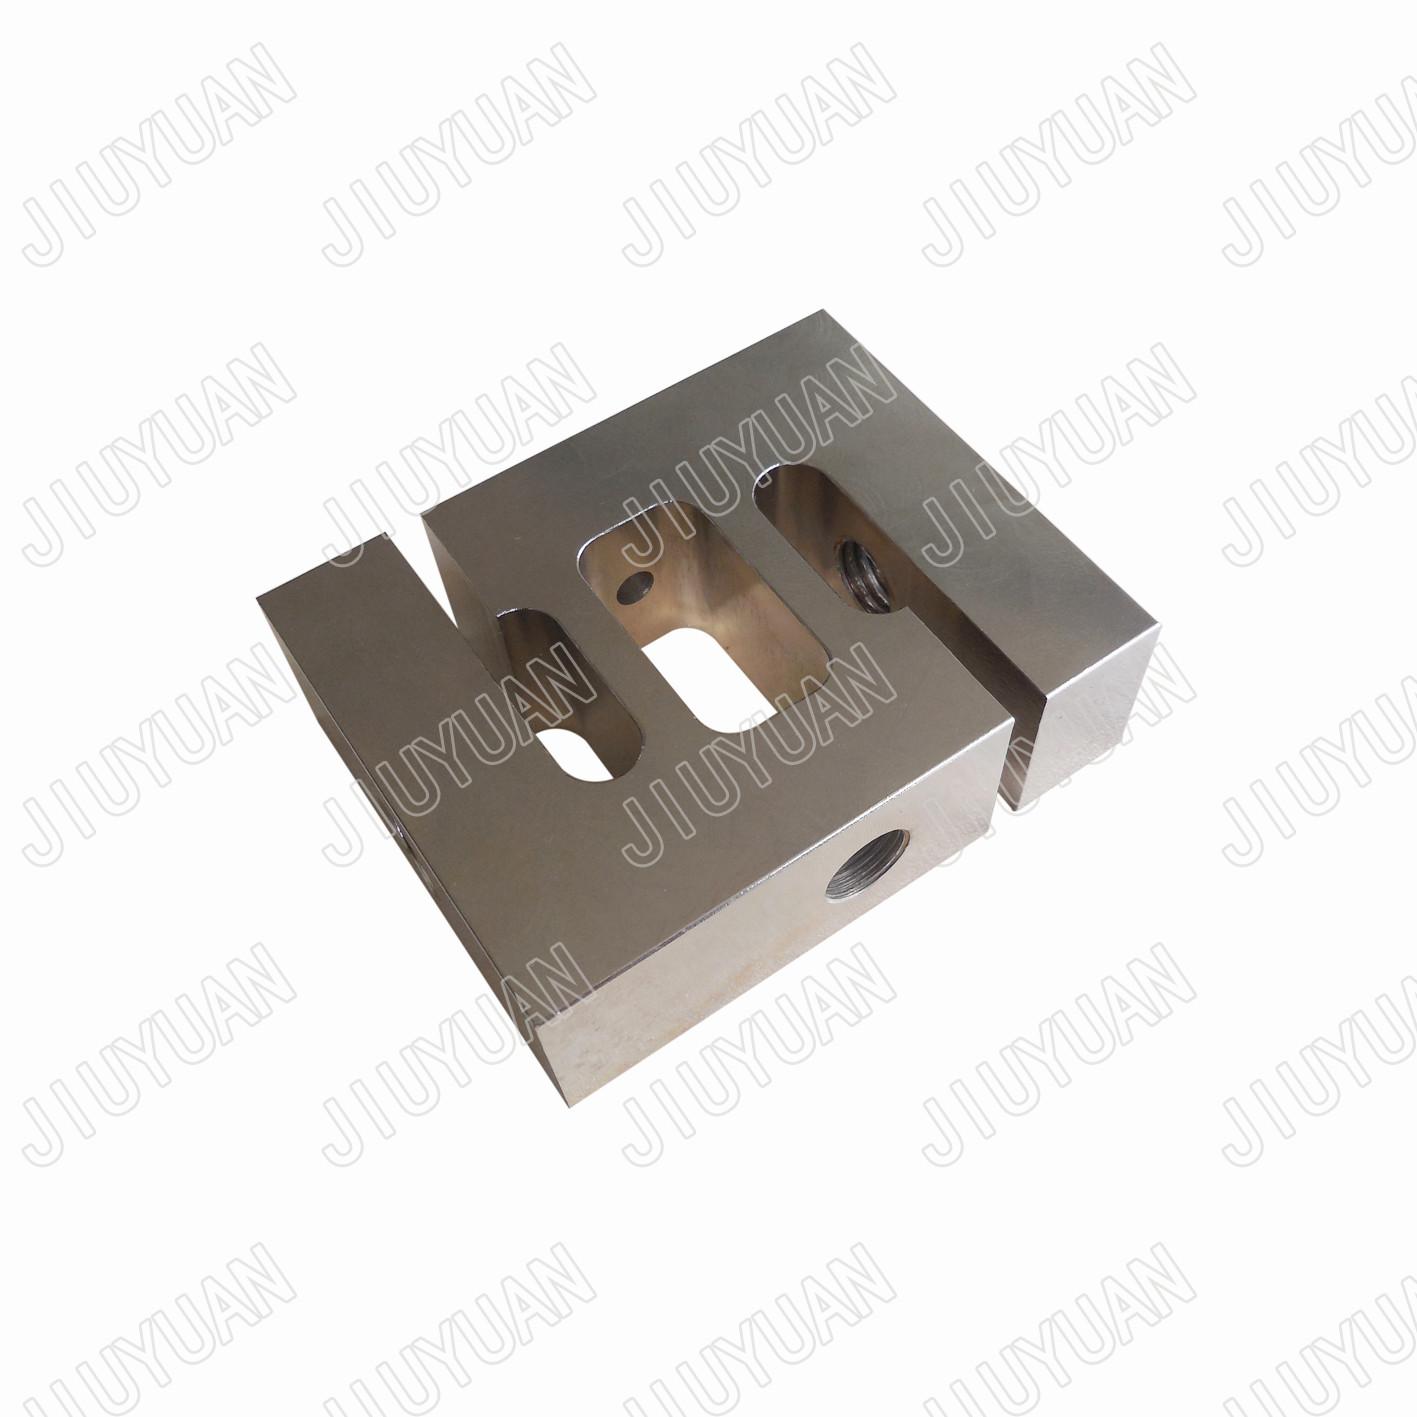 Steel CNC precision machining part for sensor